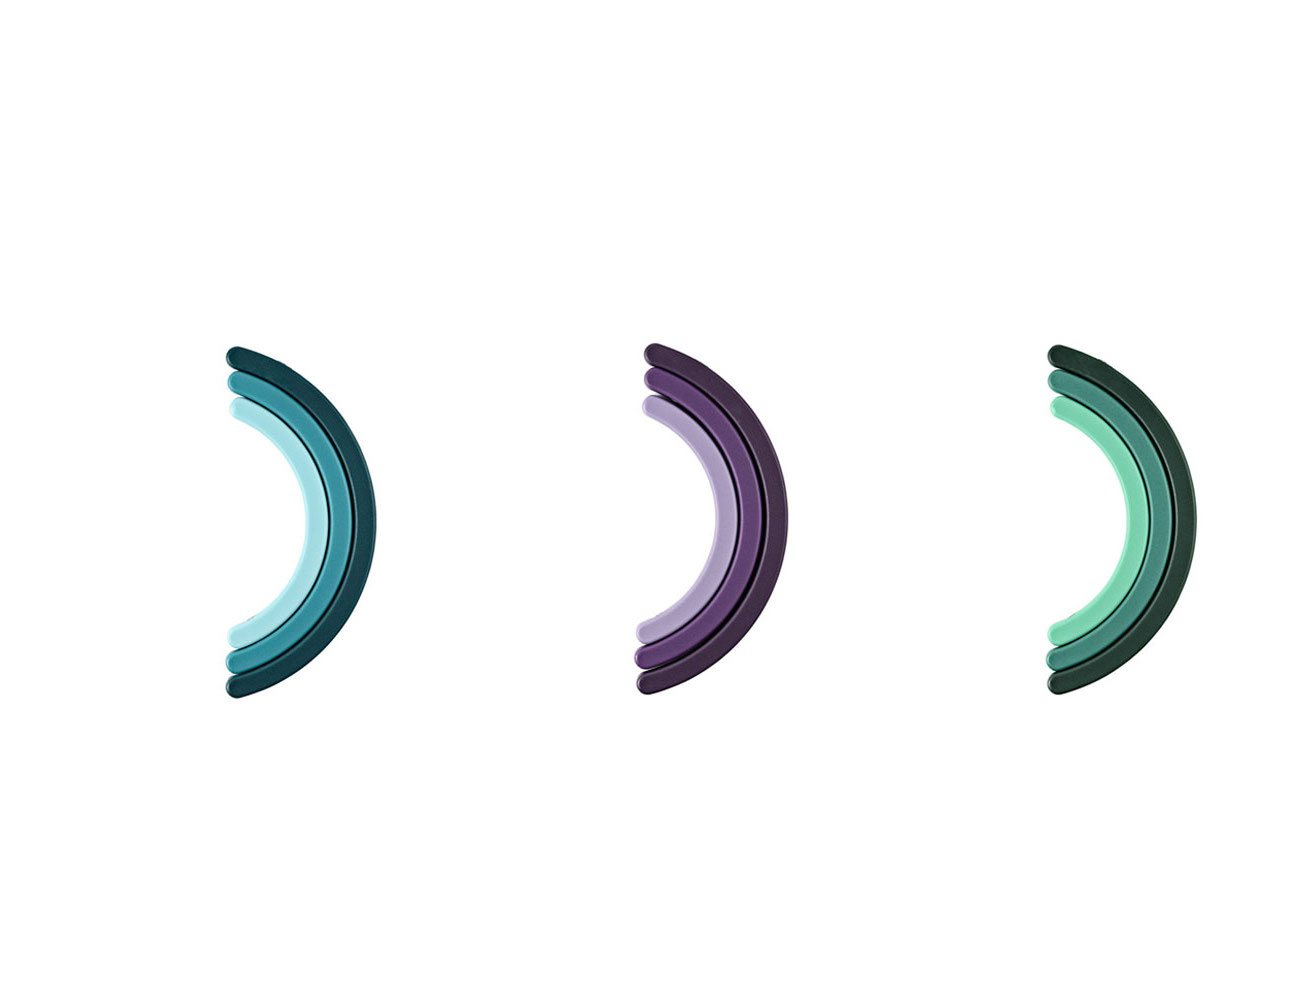 rainbow-trivet-by-normann-copenhagen-04